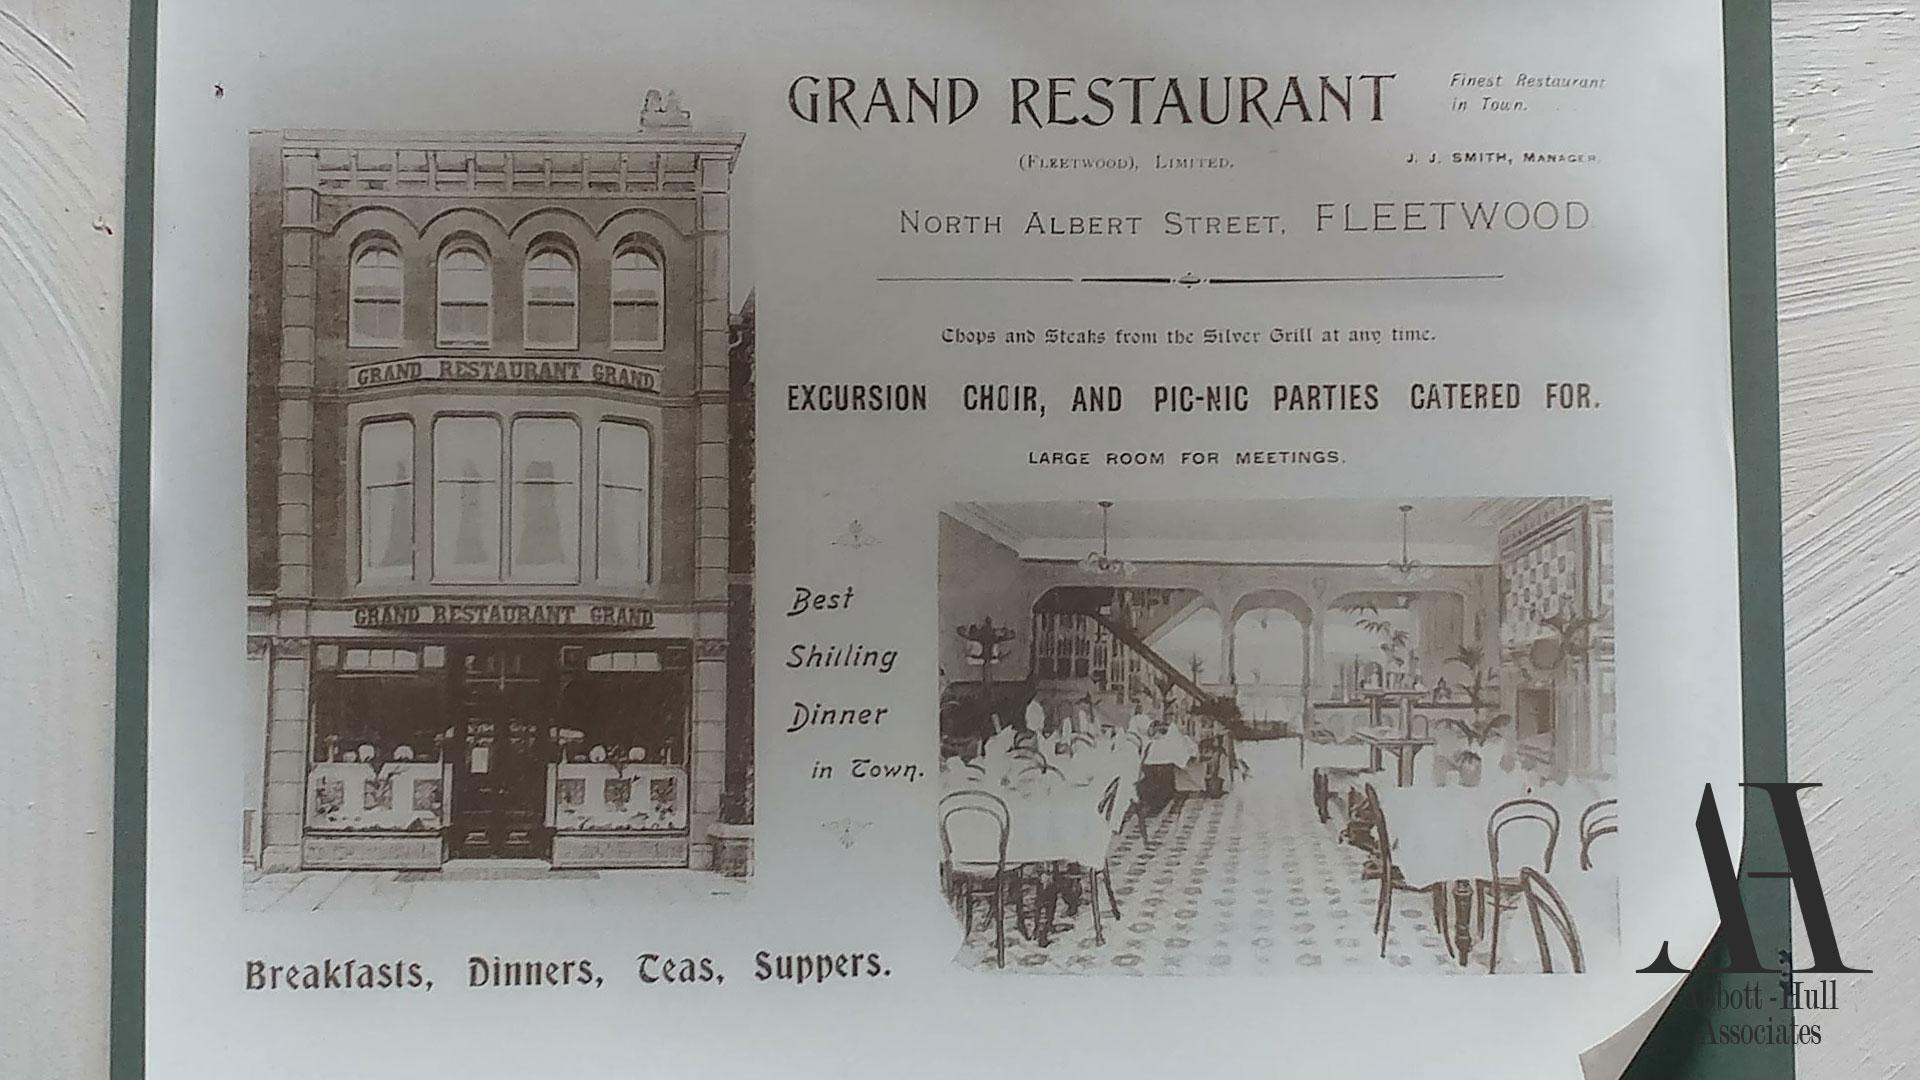 25 North Albert Street, Fleetwood - original photograph